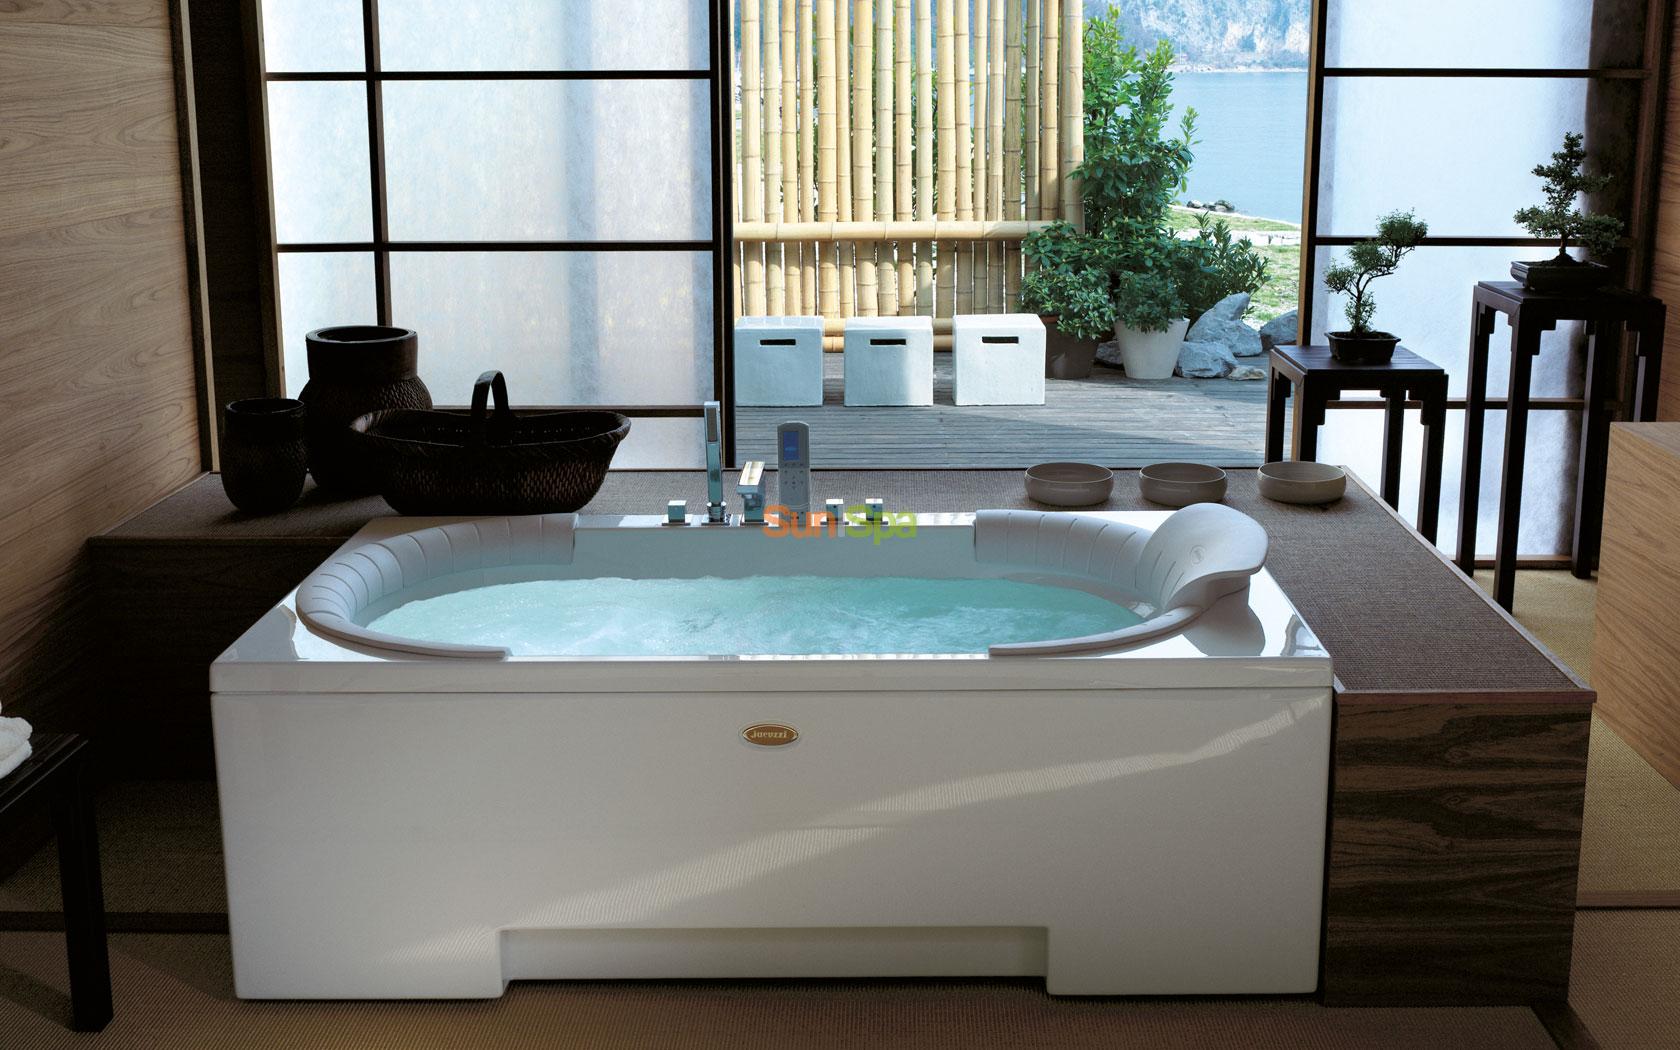 Душ или ванна с гидромассажем?